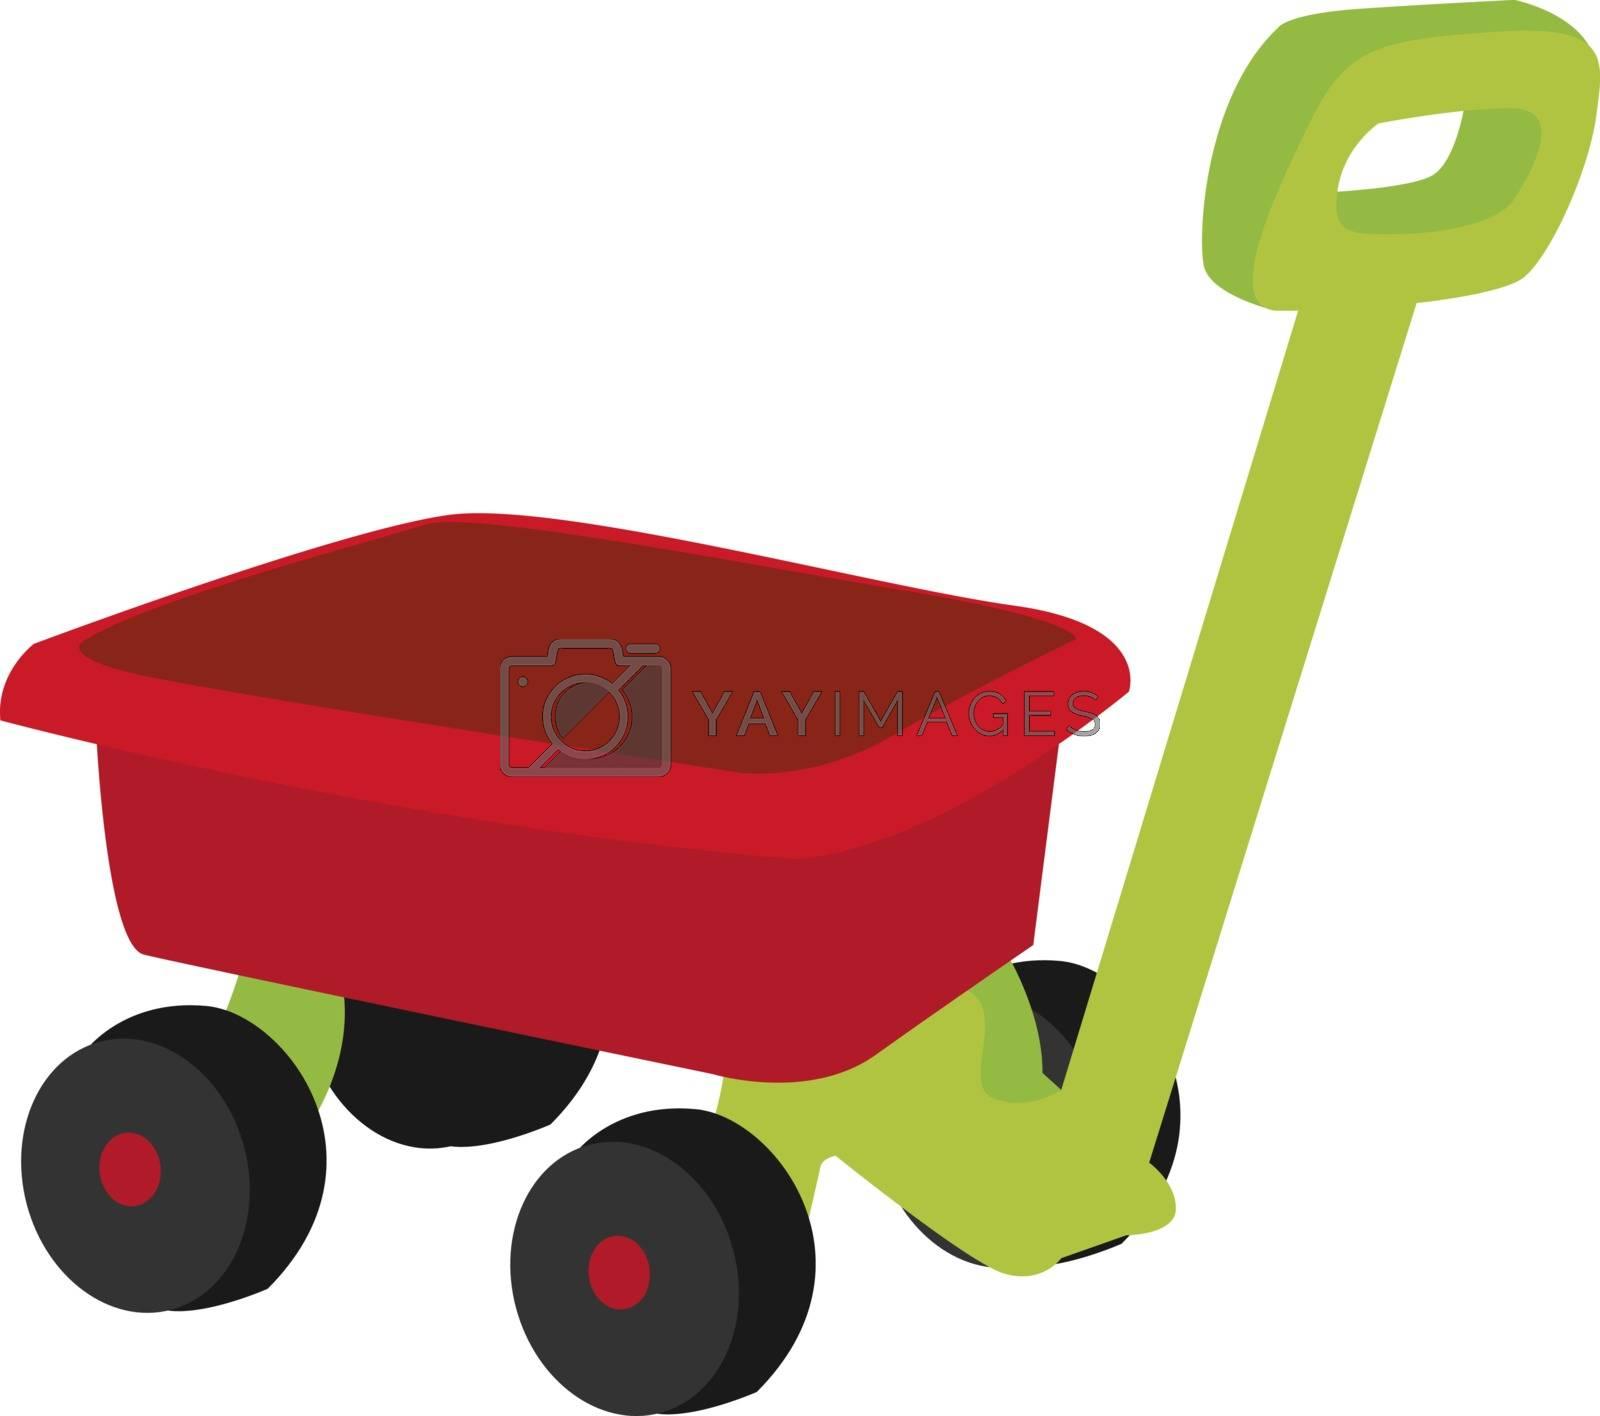 Kinder handwagen, illustration, vector on white background.